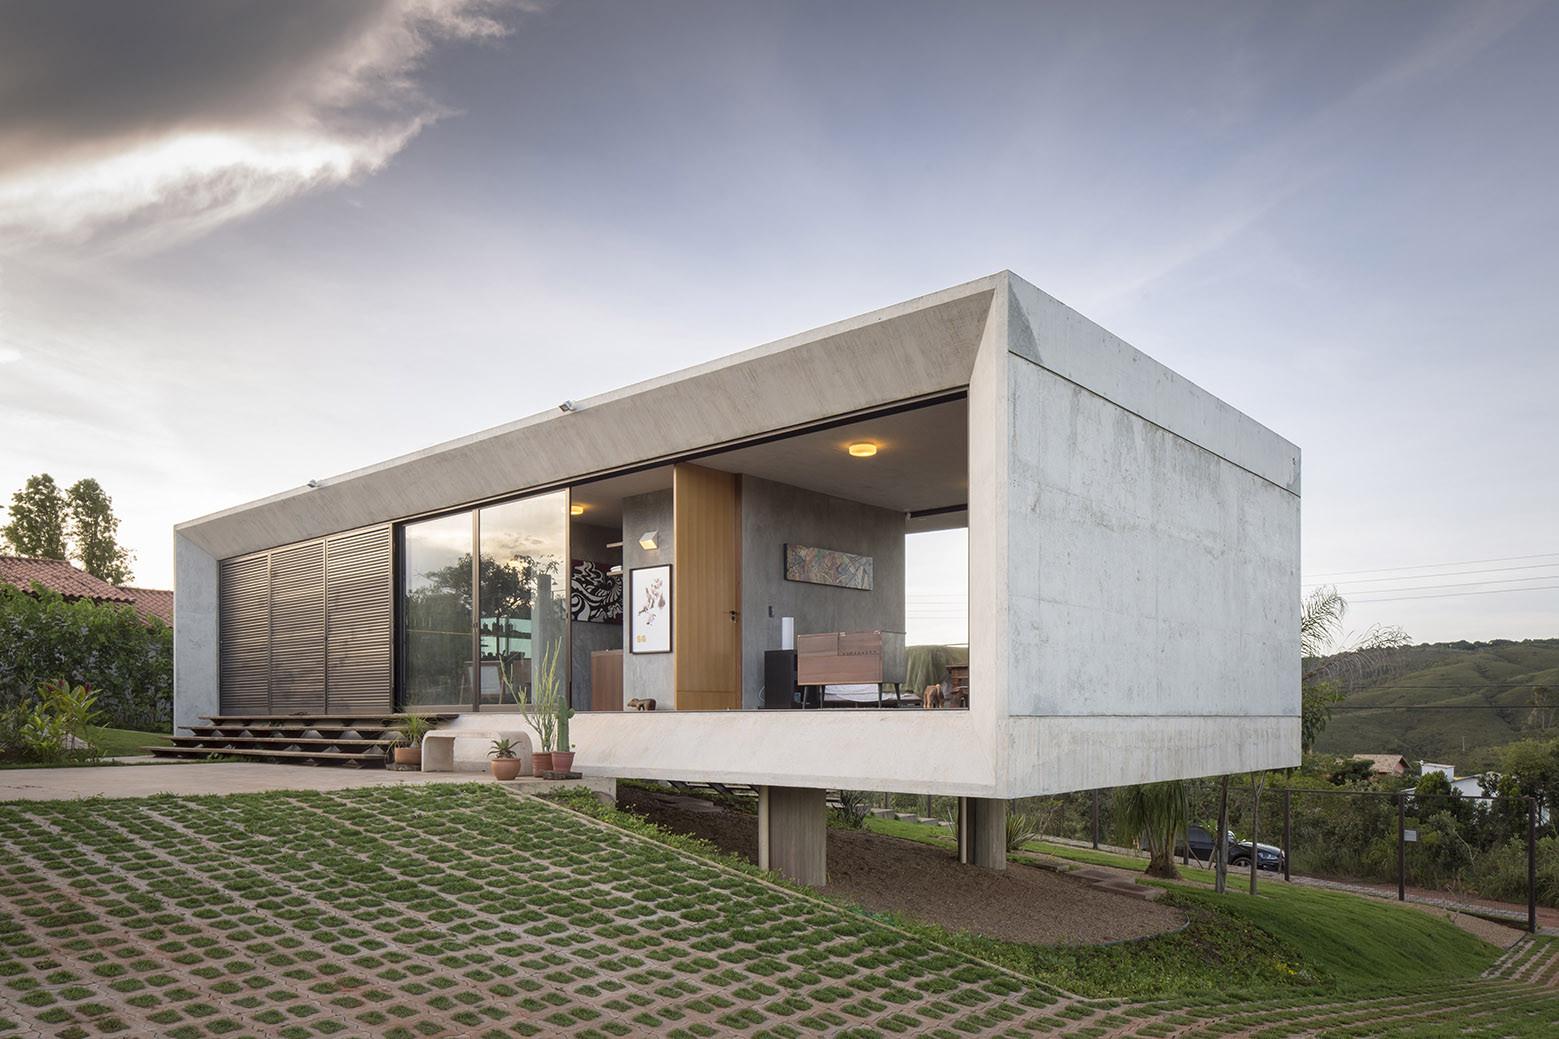 Galeria de casa solar da serra 3 4 arquitetura 7 for Viviendas estilo minimalista